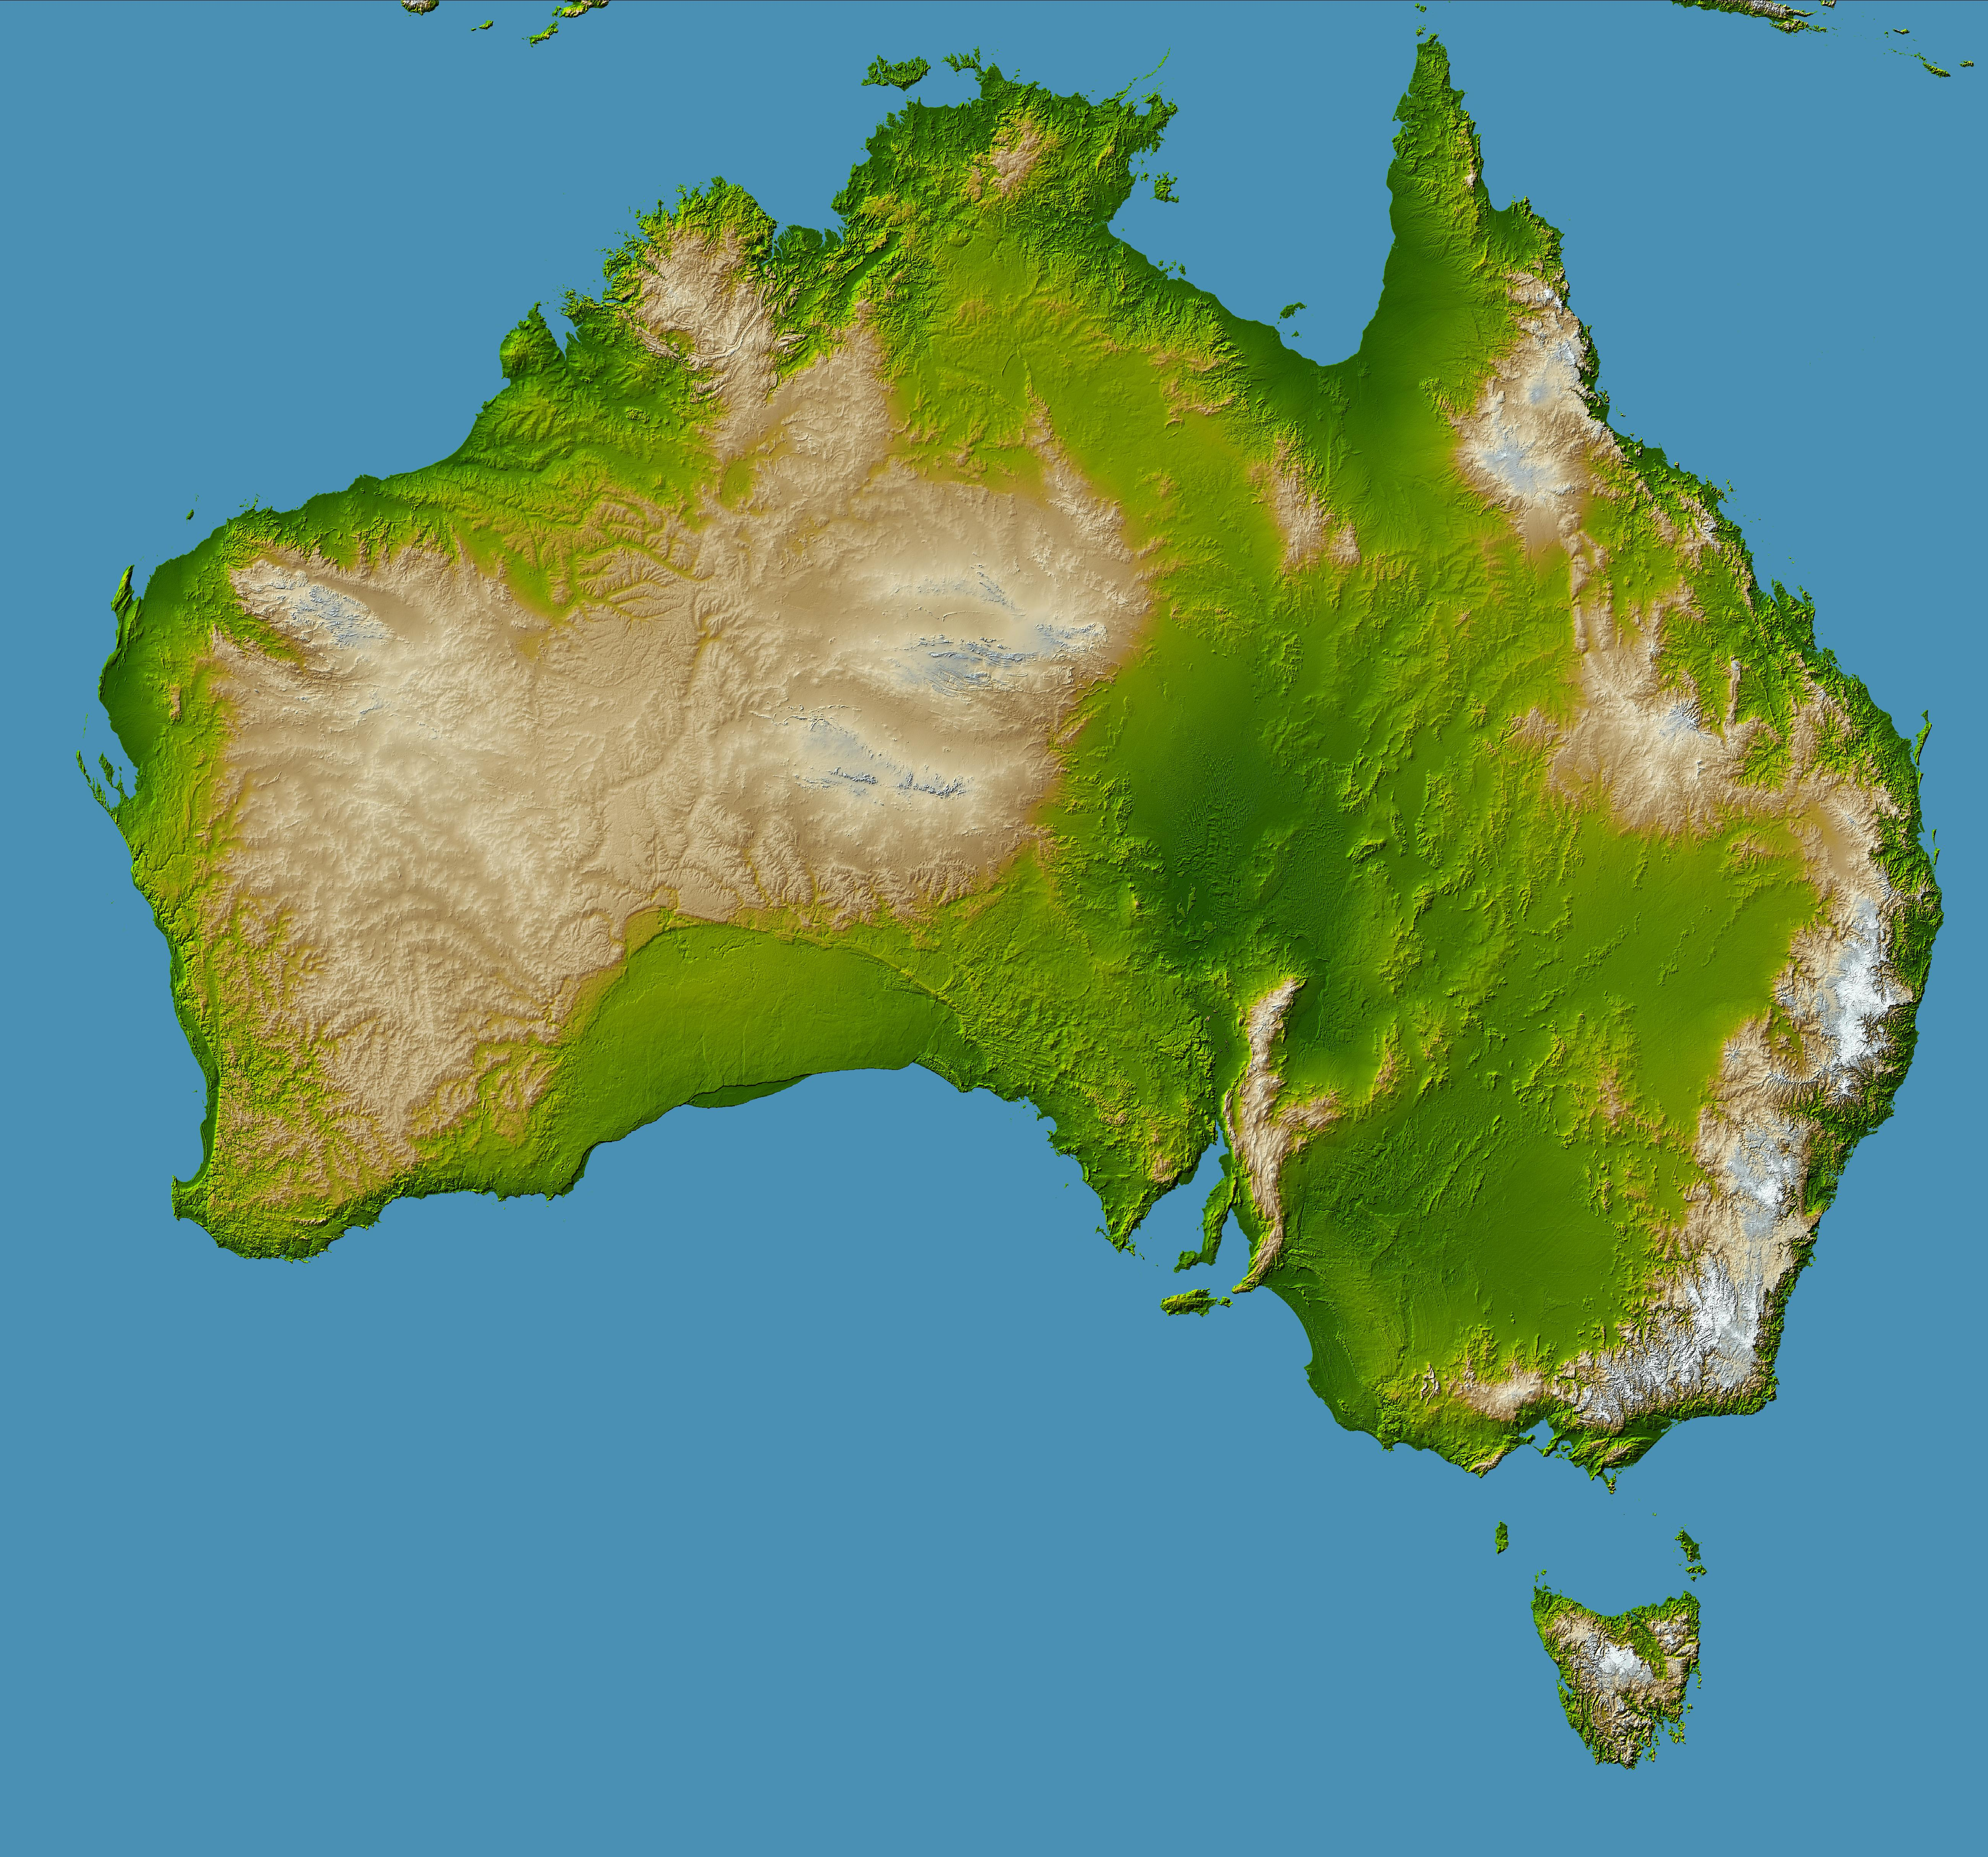 Геолози провъзгласиха нов континент - Зеландия